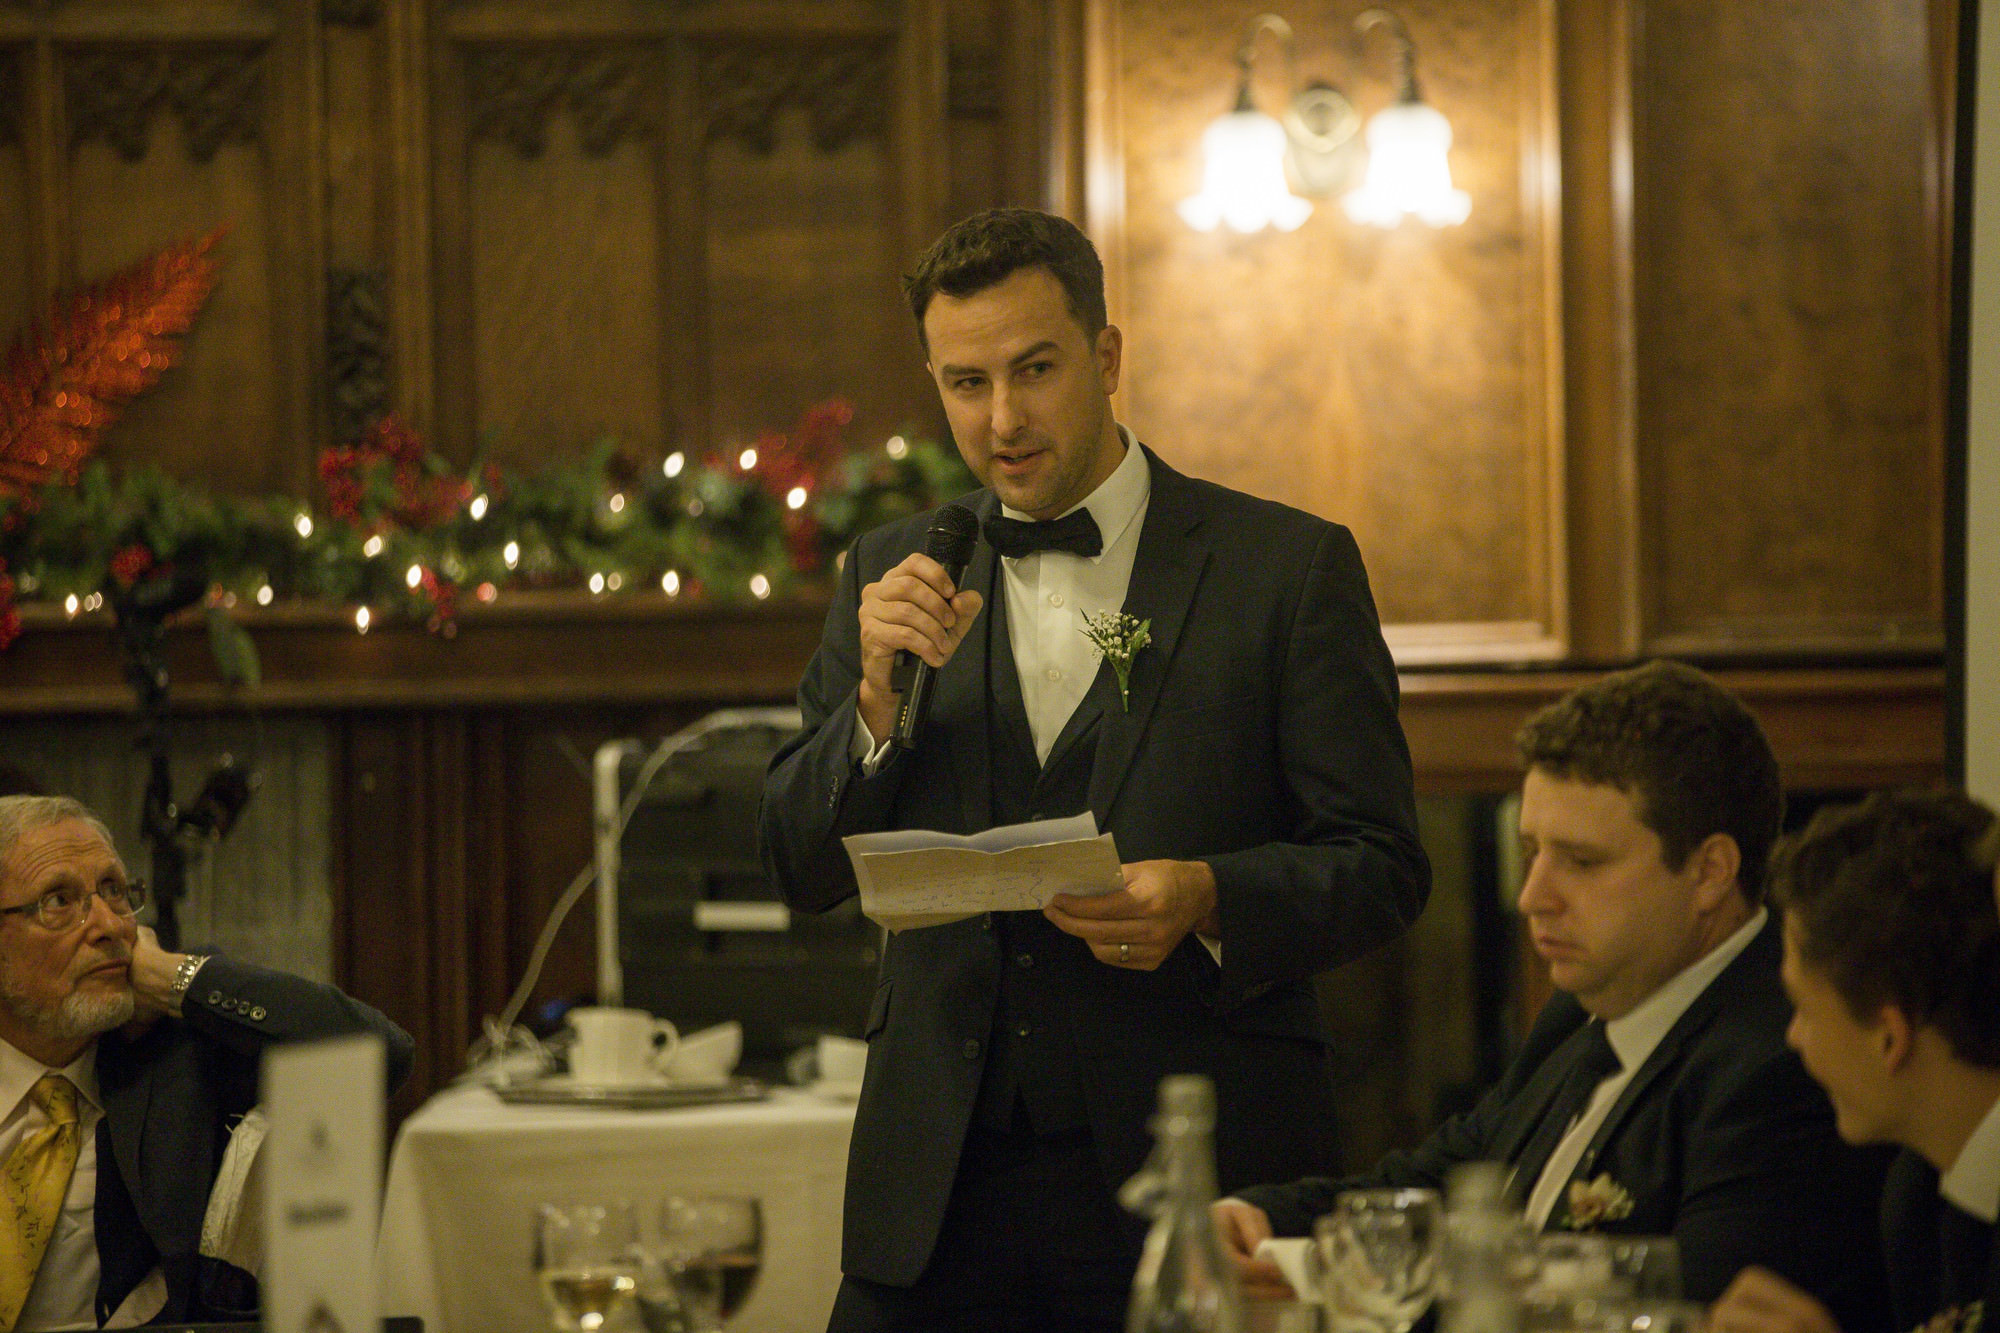 muckross_park_hotel_grougane_barra_wedding_photographer_goldenmoments_074.jpg